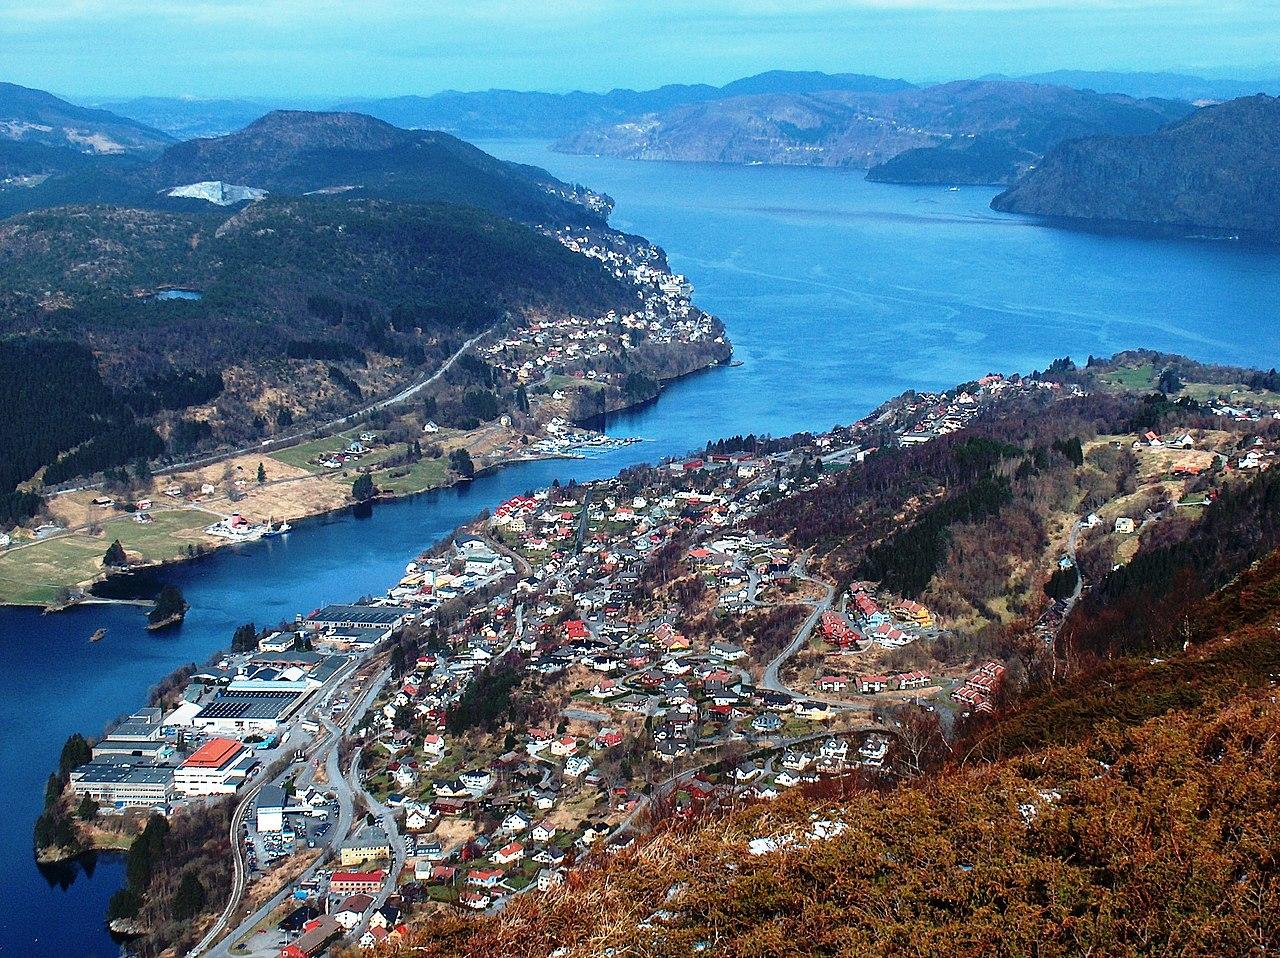 Brazil Dating Eskorte Oslo Norsk Private Girls Escorts Desi Escort Sex I Dusjen Dogging Norway